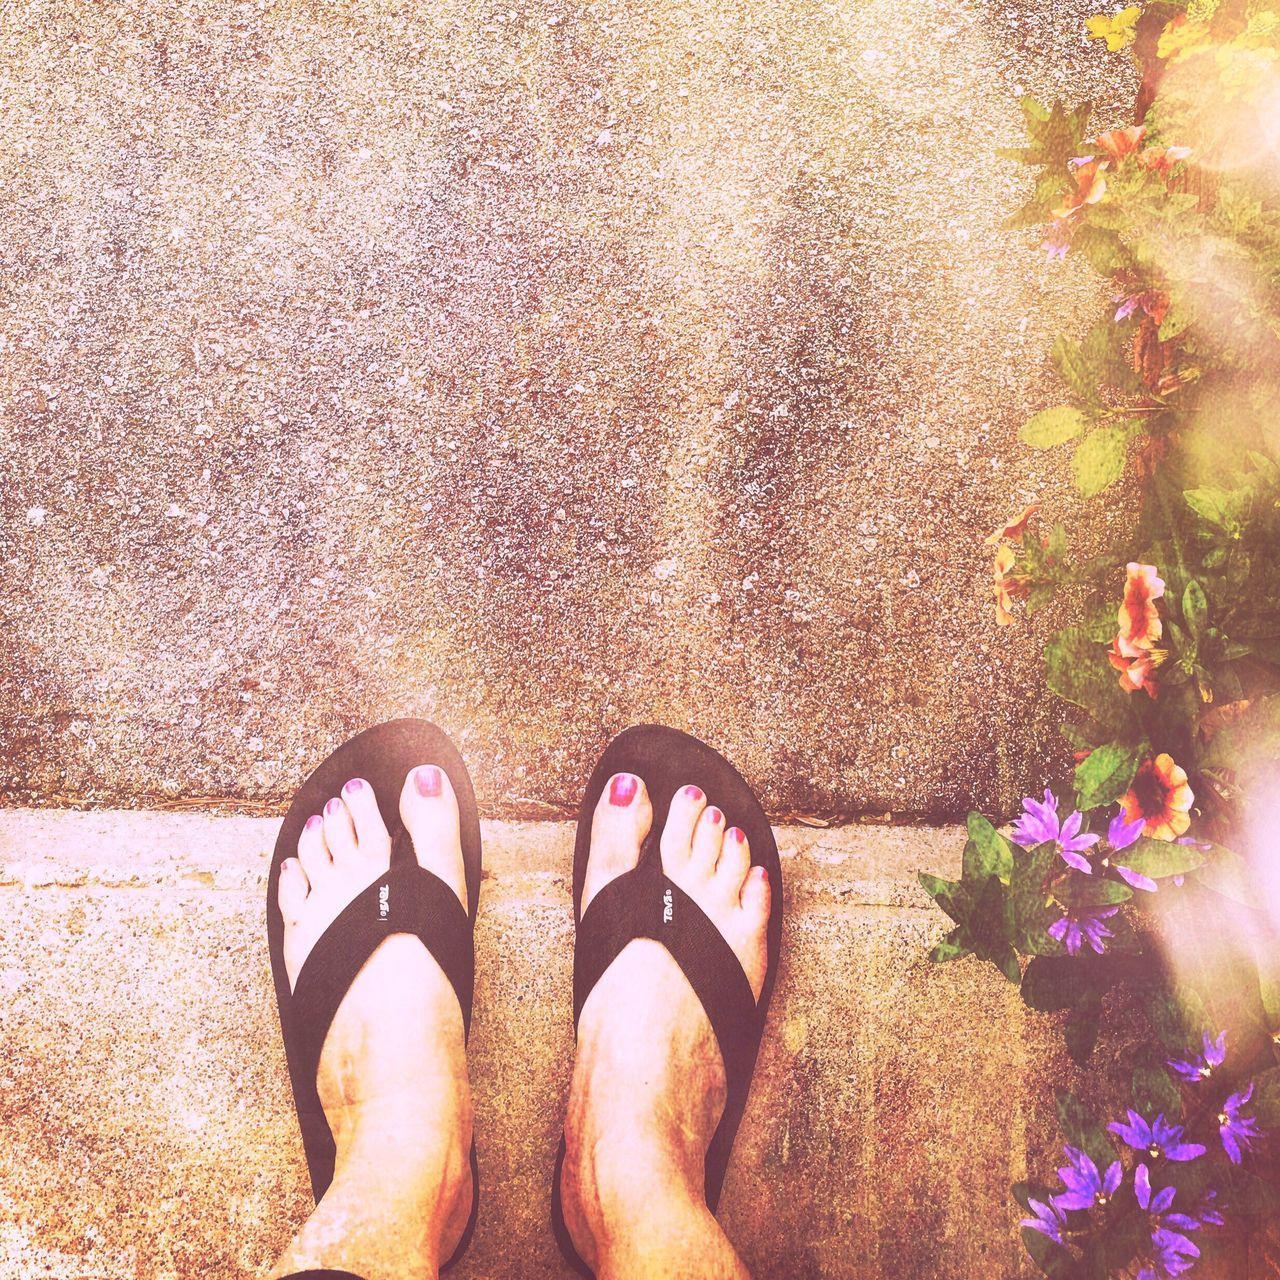 Summer #summertime #sun #TagsForLikes.com #hot #sunny #warm #fun #beautiful #sky #clearskys #season #seasons #instagood #instasummer #photooftheday #nature #TFLers #clearsky #bluesky #vacationtime #weather #summerweather #sunshine #summertimeshine Season  Sandalsandtoes Season